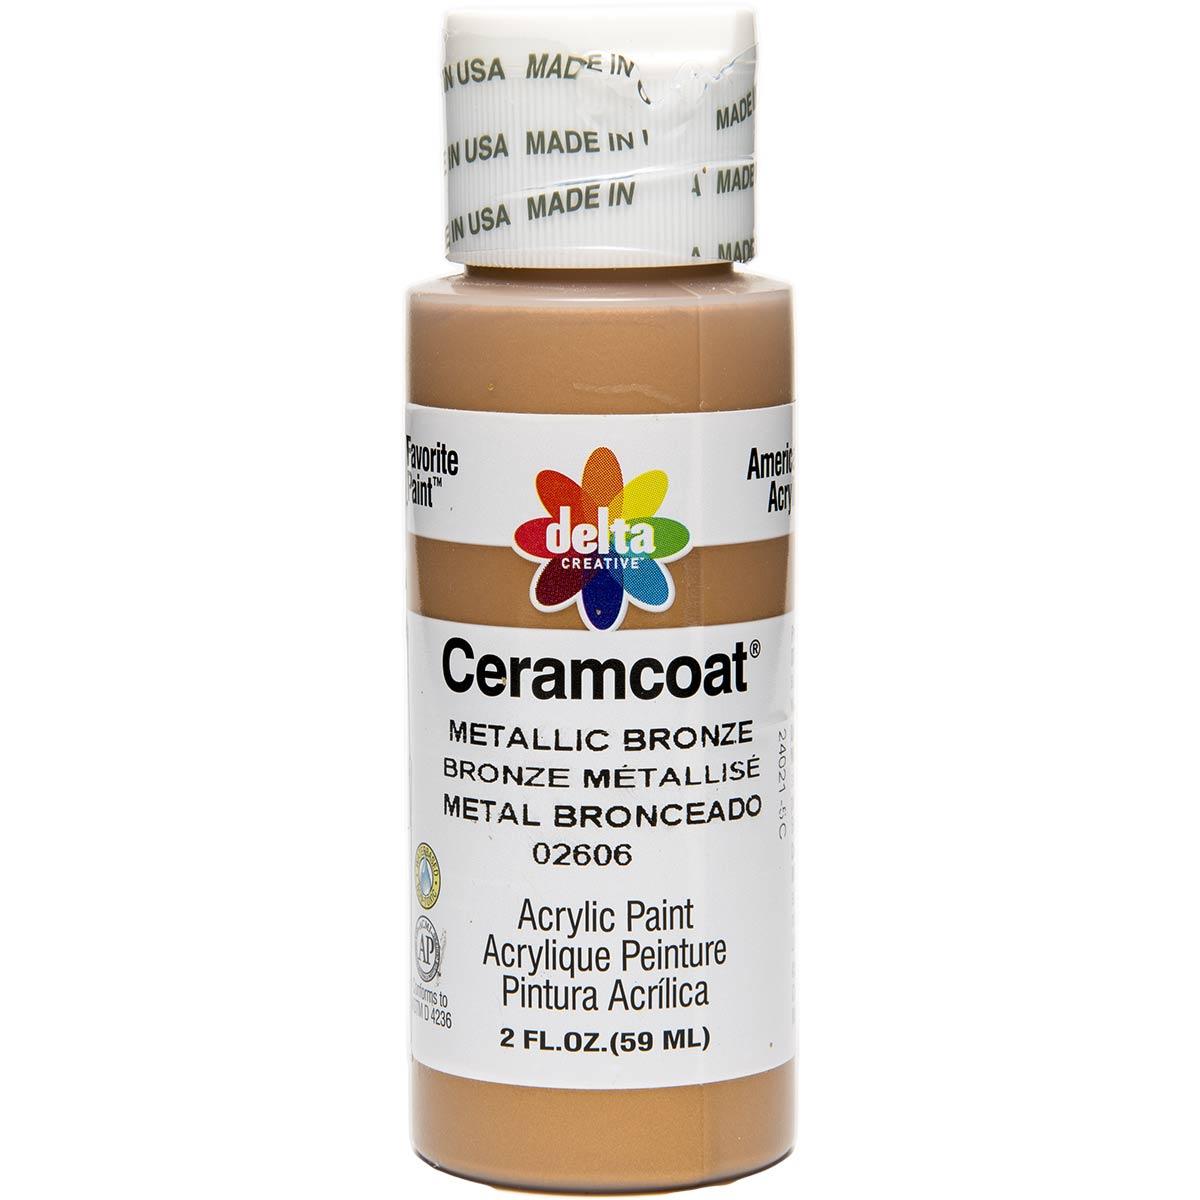 Delta Ceramcoat ® Acrylic Paint - Metallic Bronze, 2 oz. - 026060202W